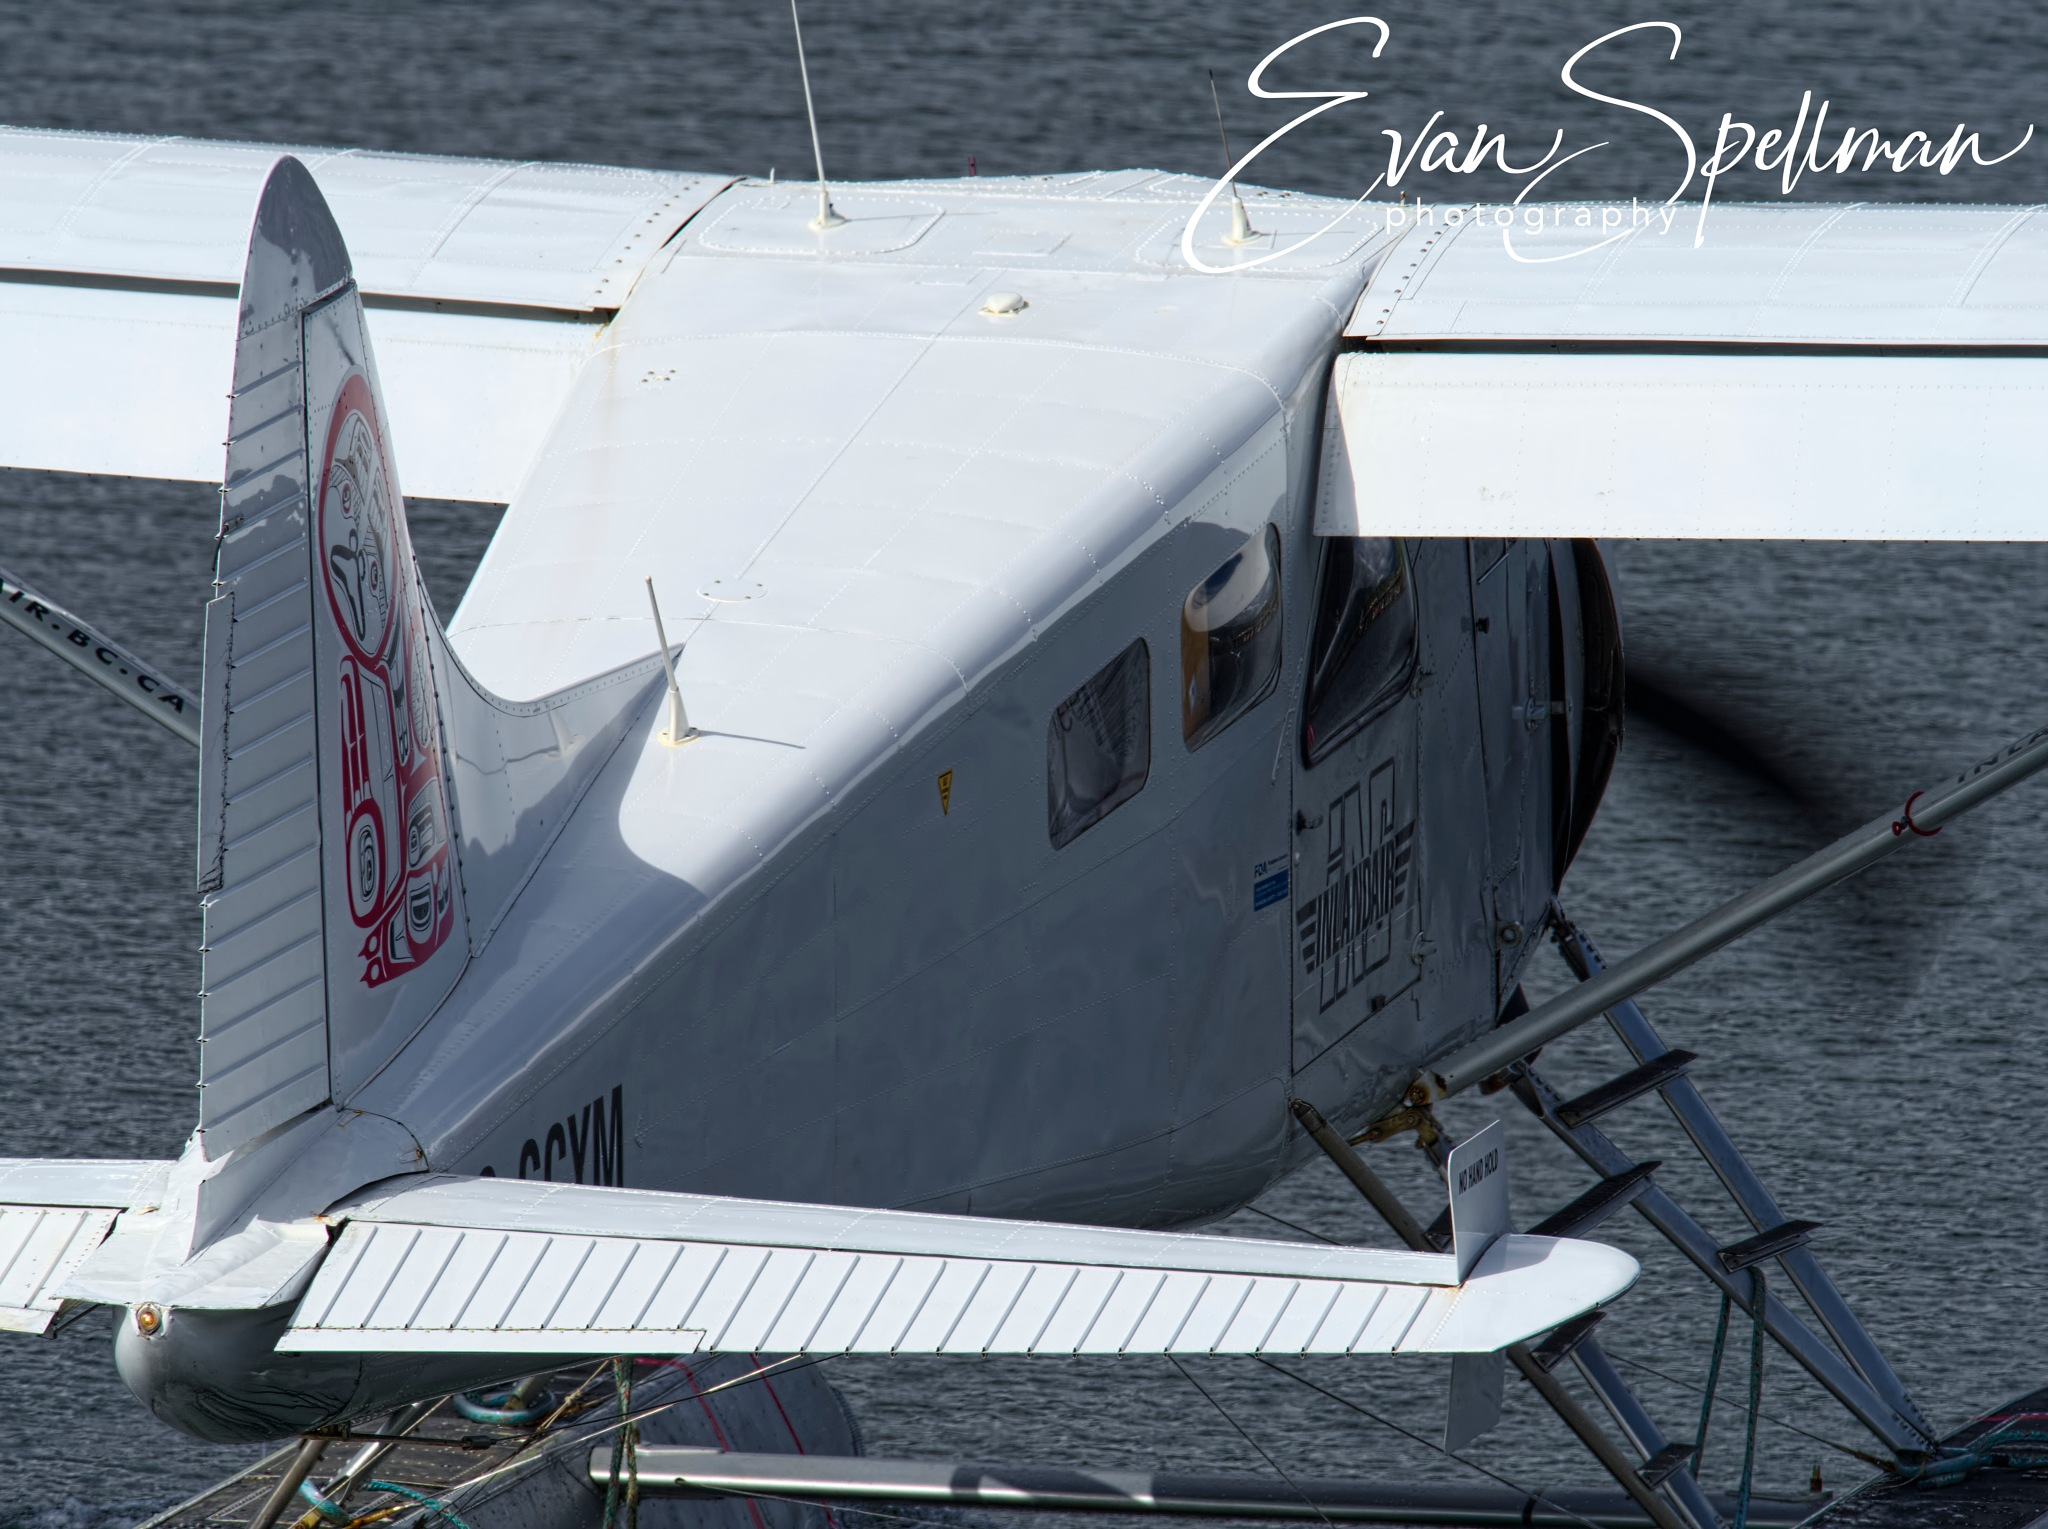 leaving the dock-engine running by Evan Spellman